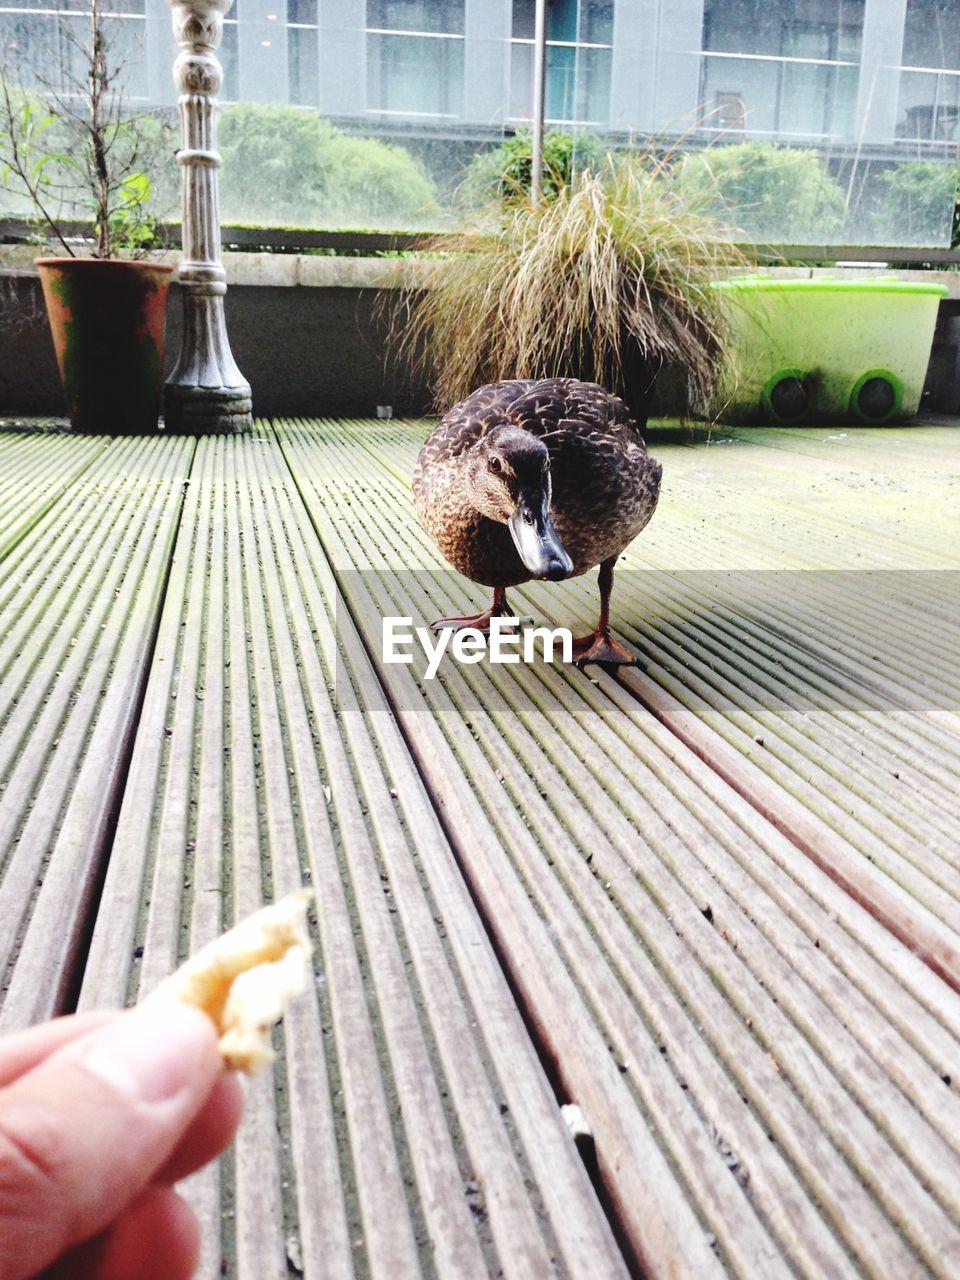 Cropped hand feeding duck